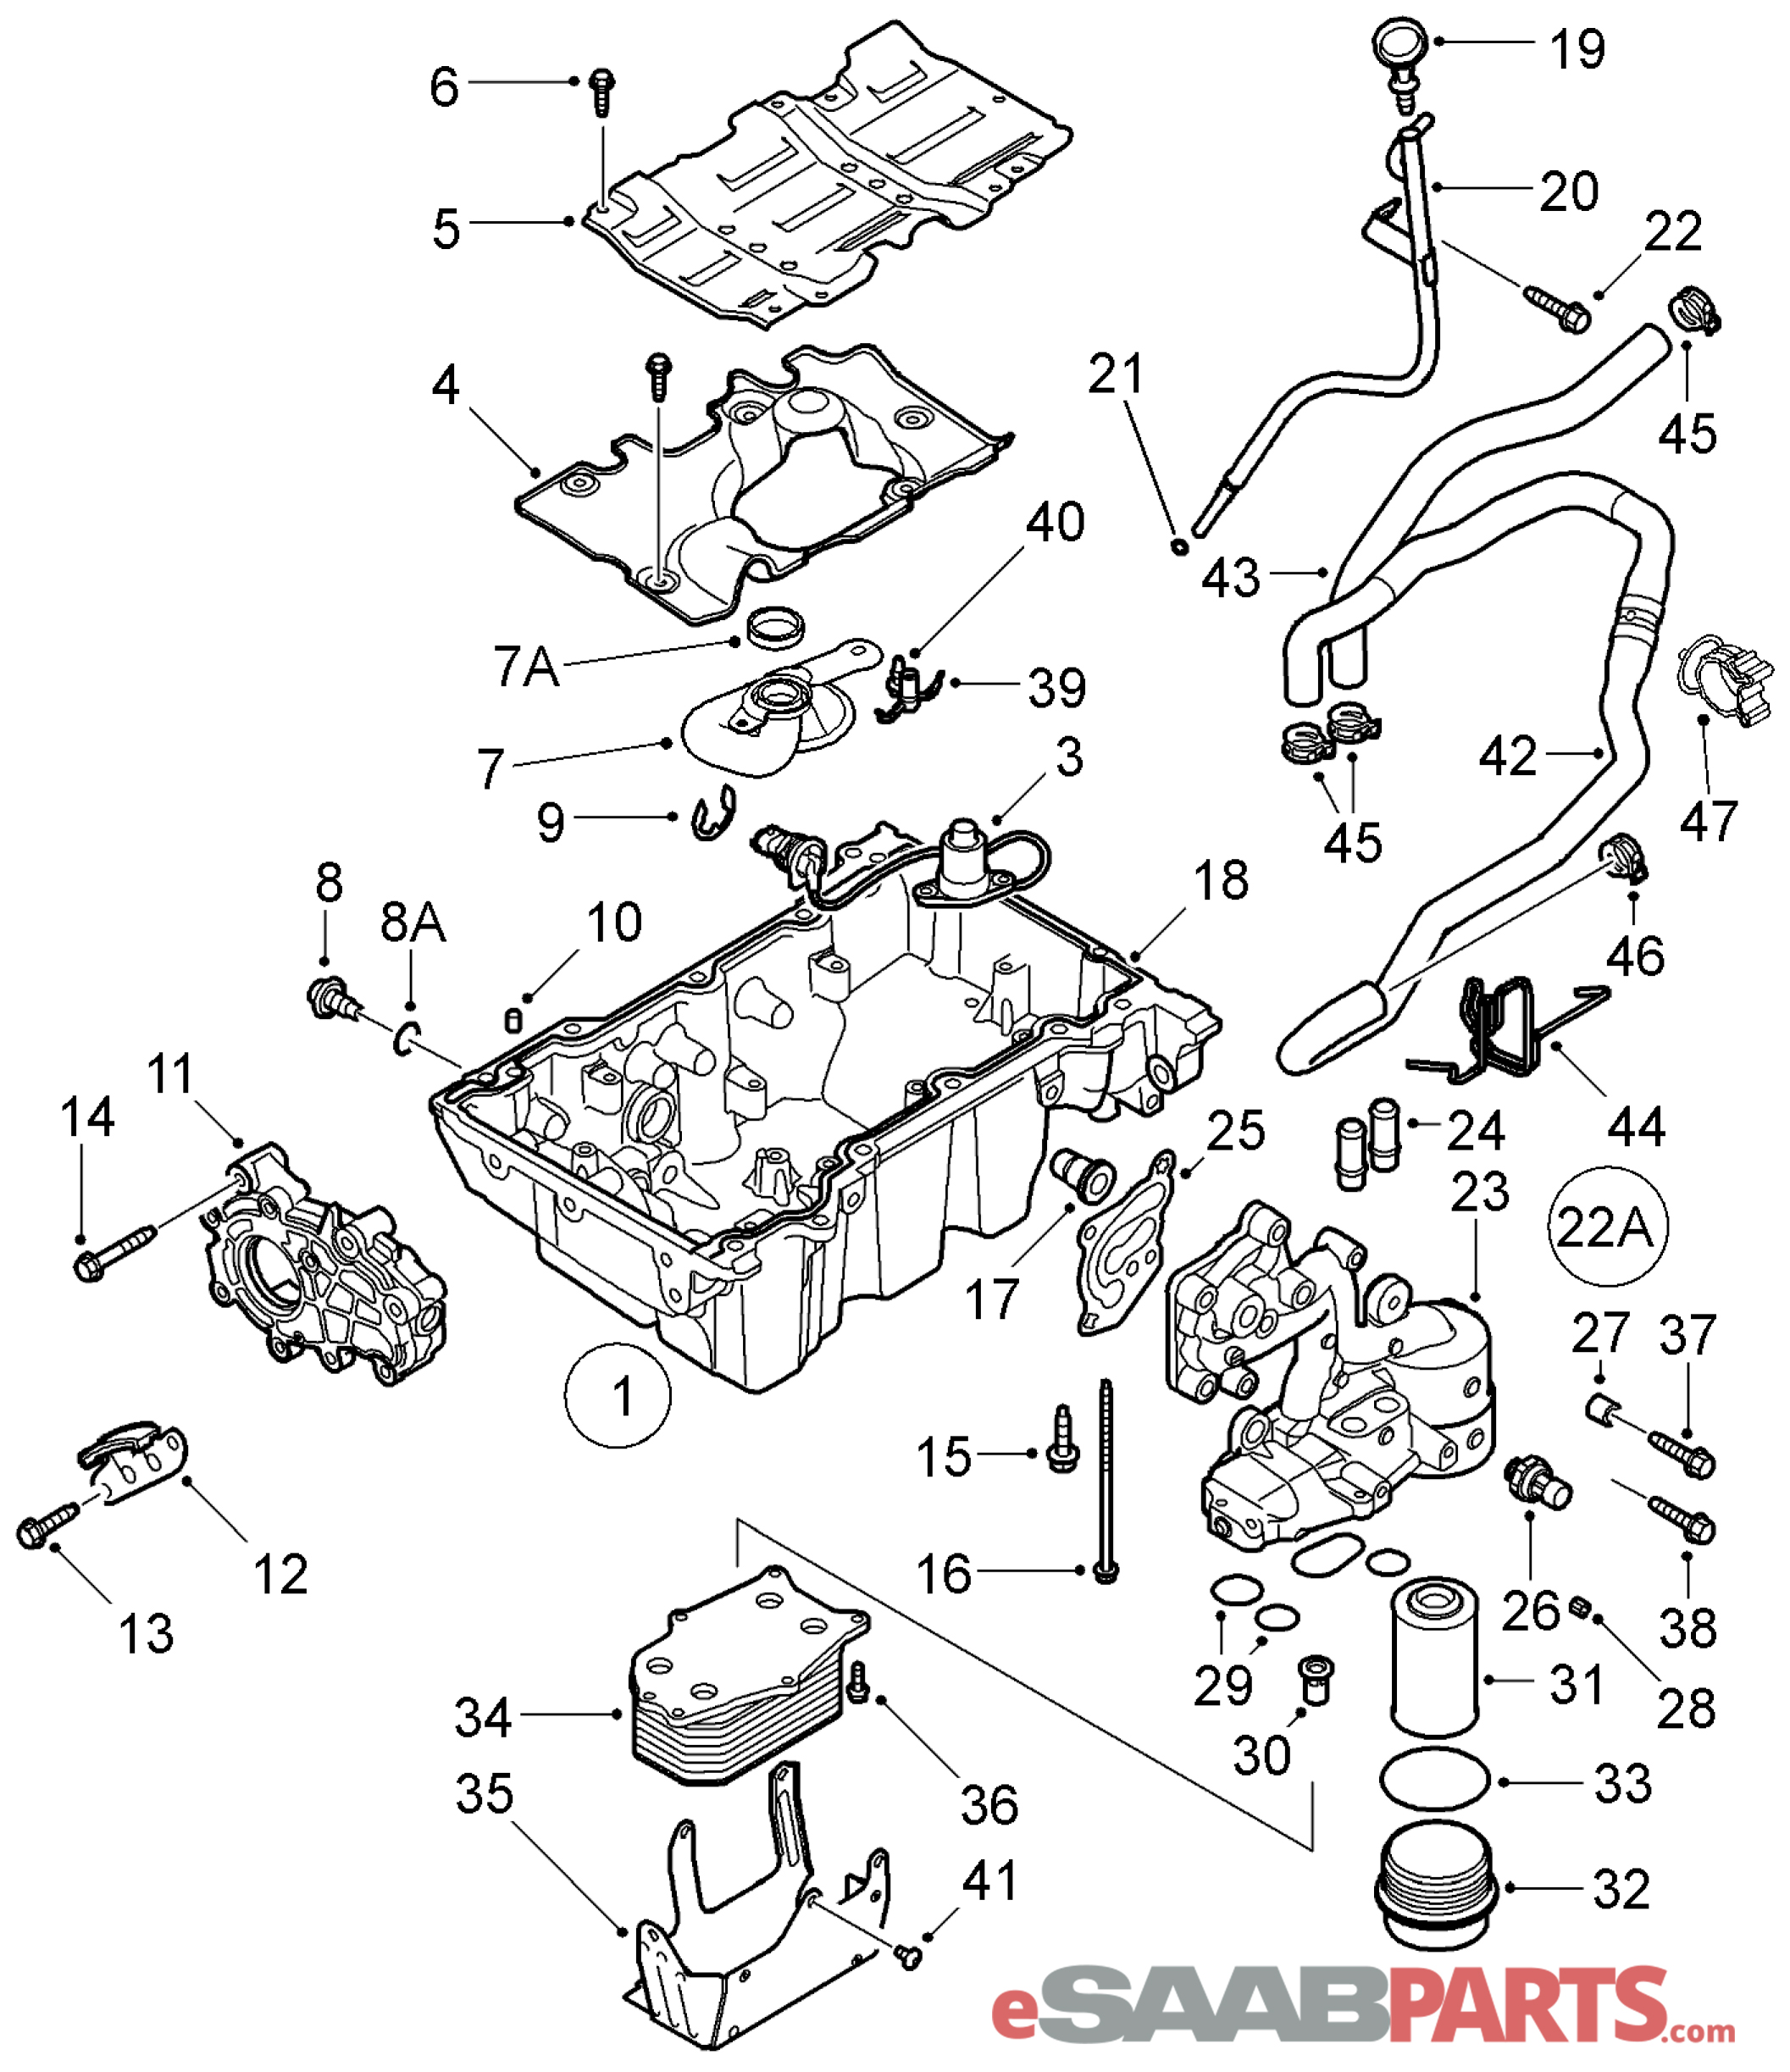 gsr vtec wiring diagram wiring diagrams pictures